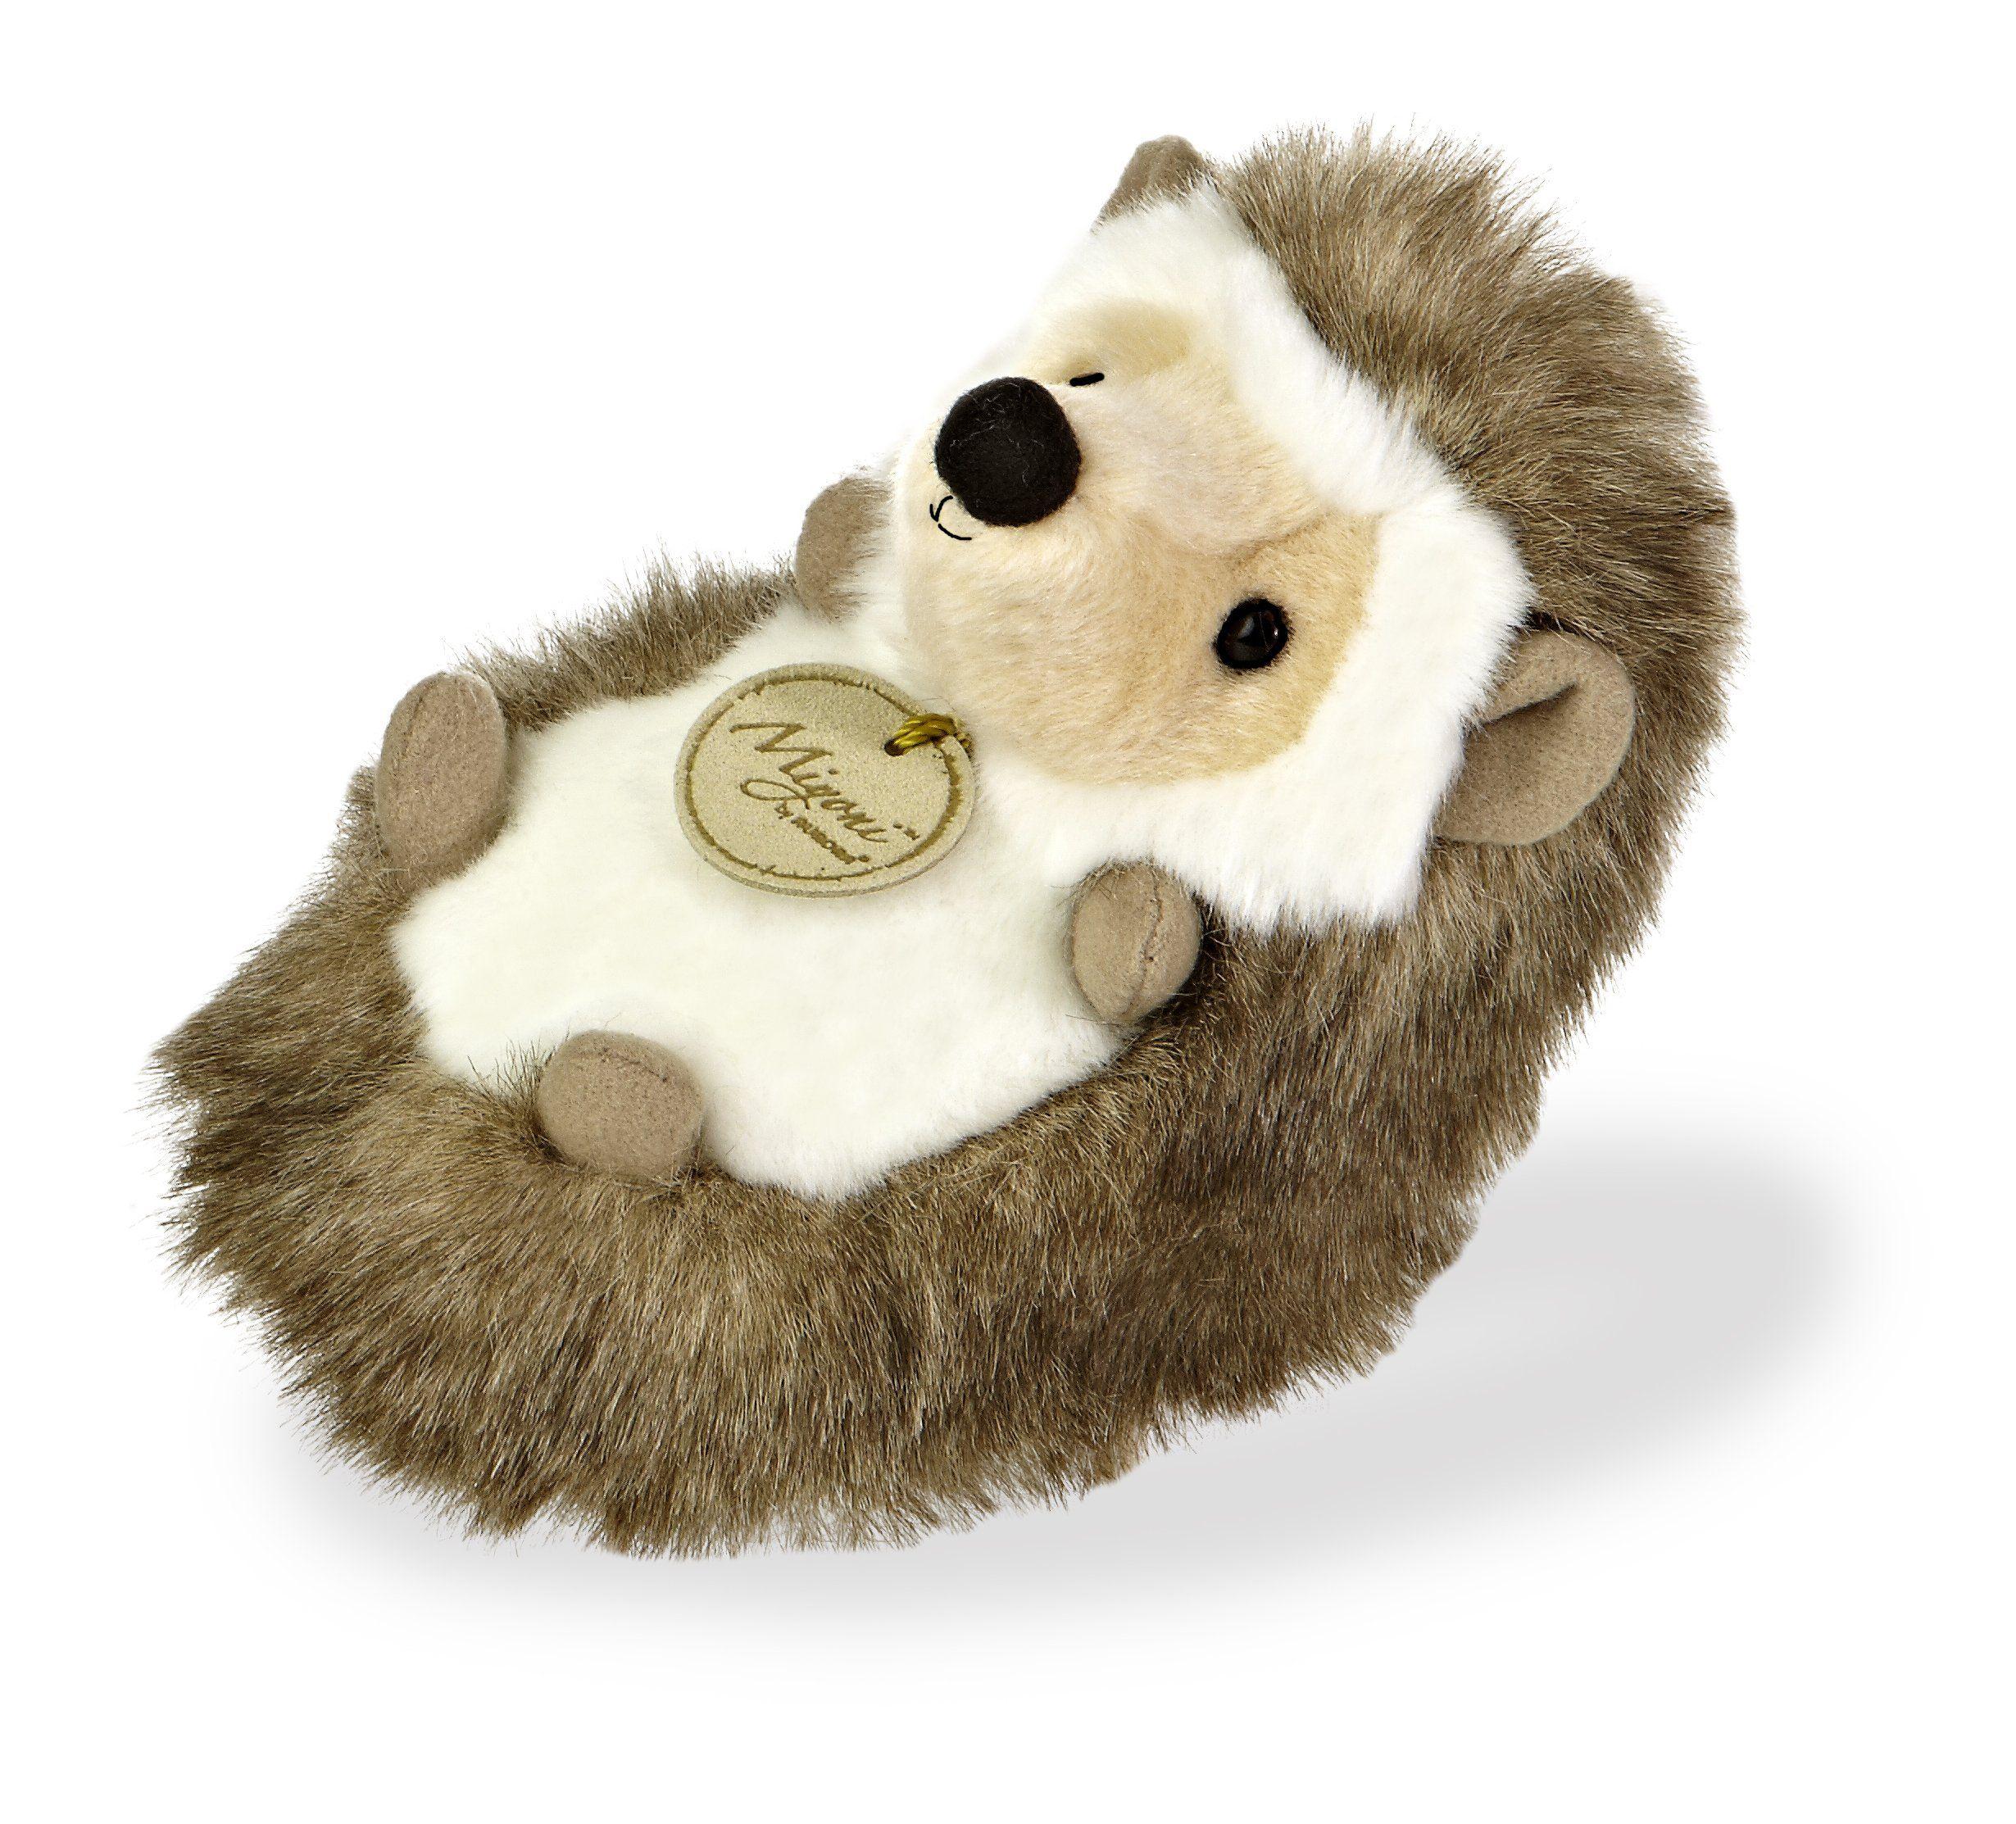 Aurora World Miyoni Small Hedgehog Plush Teddy Bear Stuffed Animal Plush Animals Plush Toy [ 2226 x 2460 Pixel ]